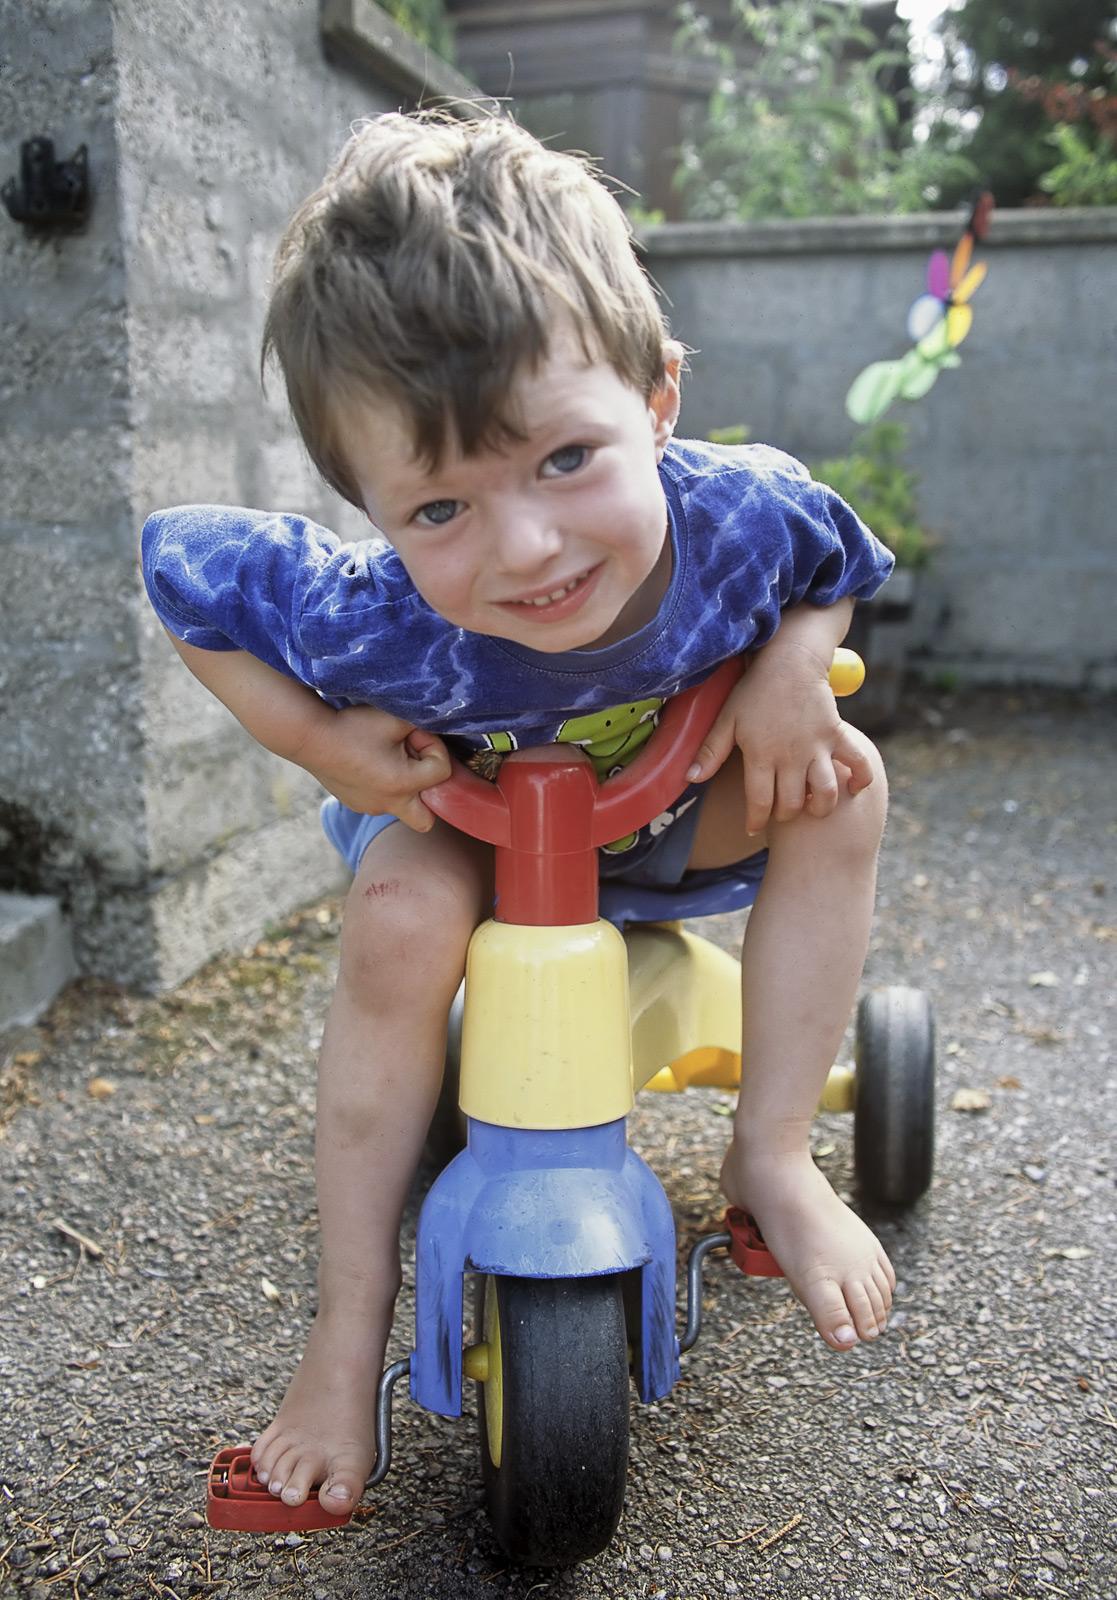 Ben on Trike, Forres, Moray, Scotland, nostalgic, Ben, scraped, knee, bruise, excitement, legs, scanner, dust, photo